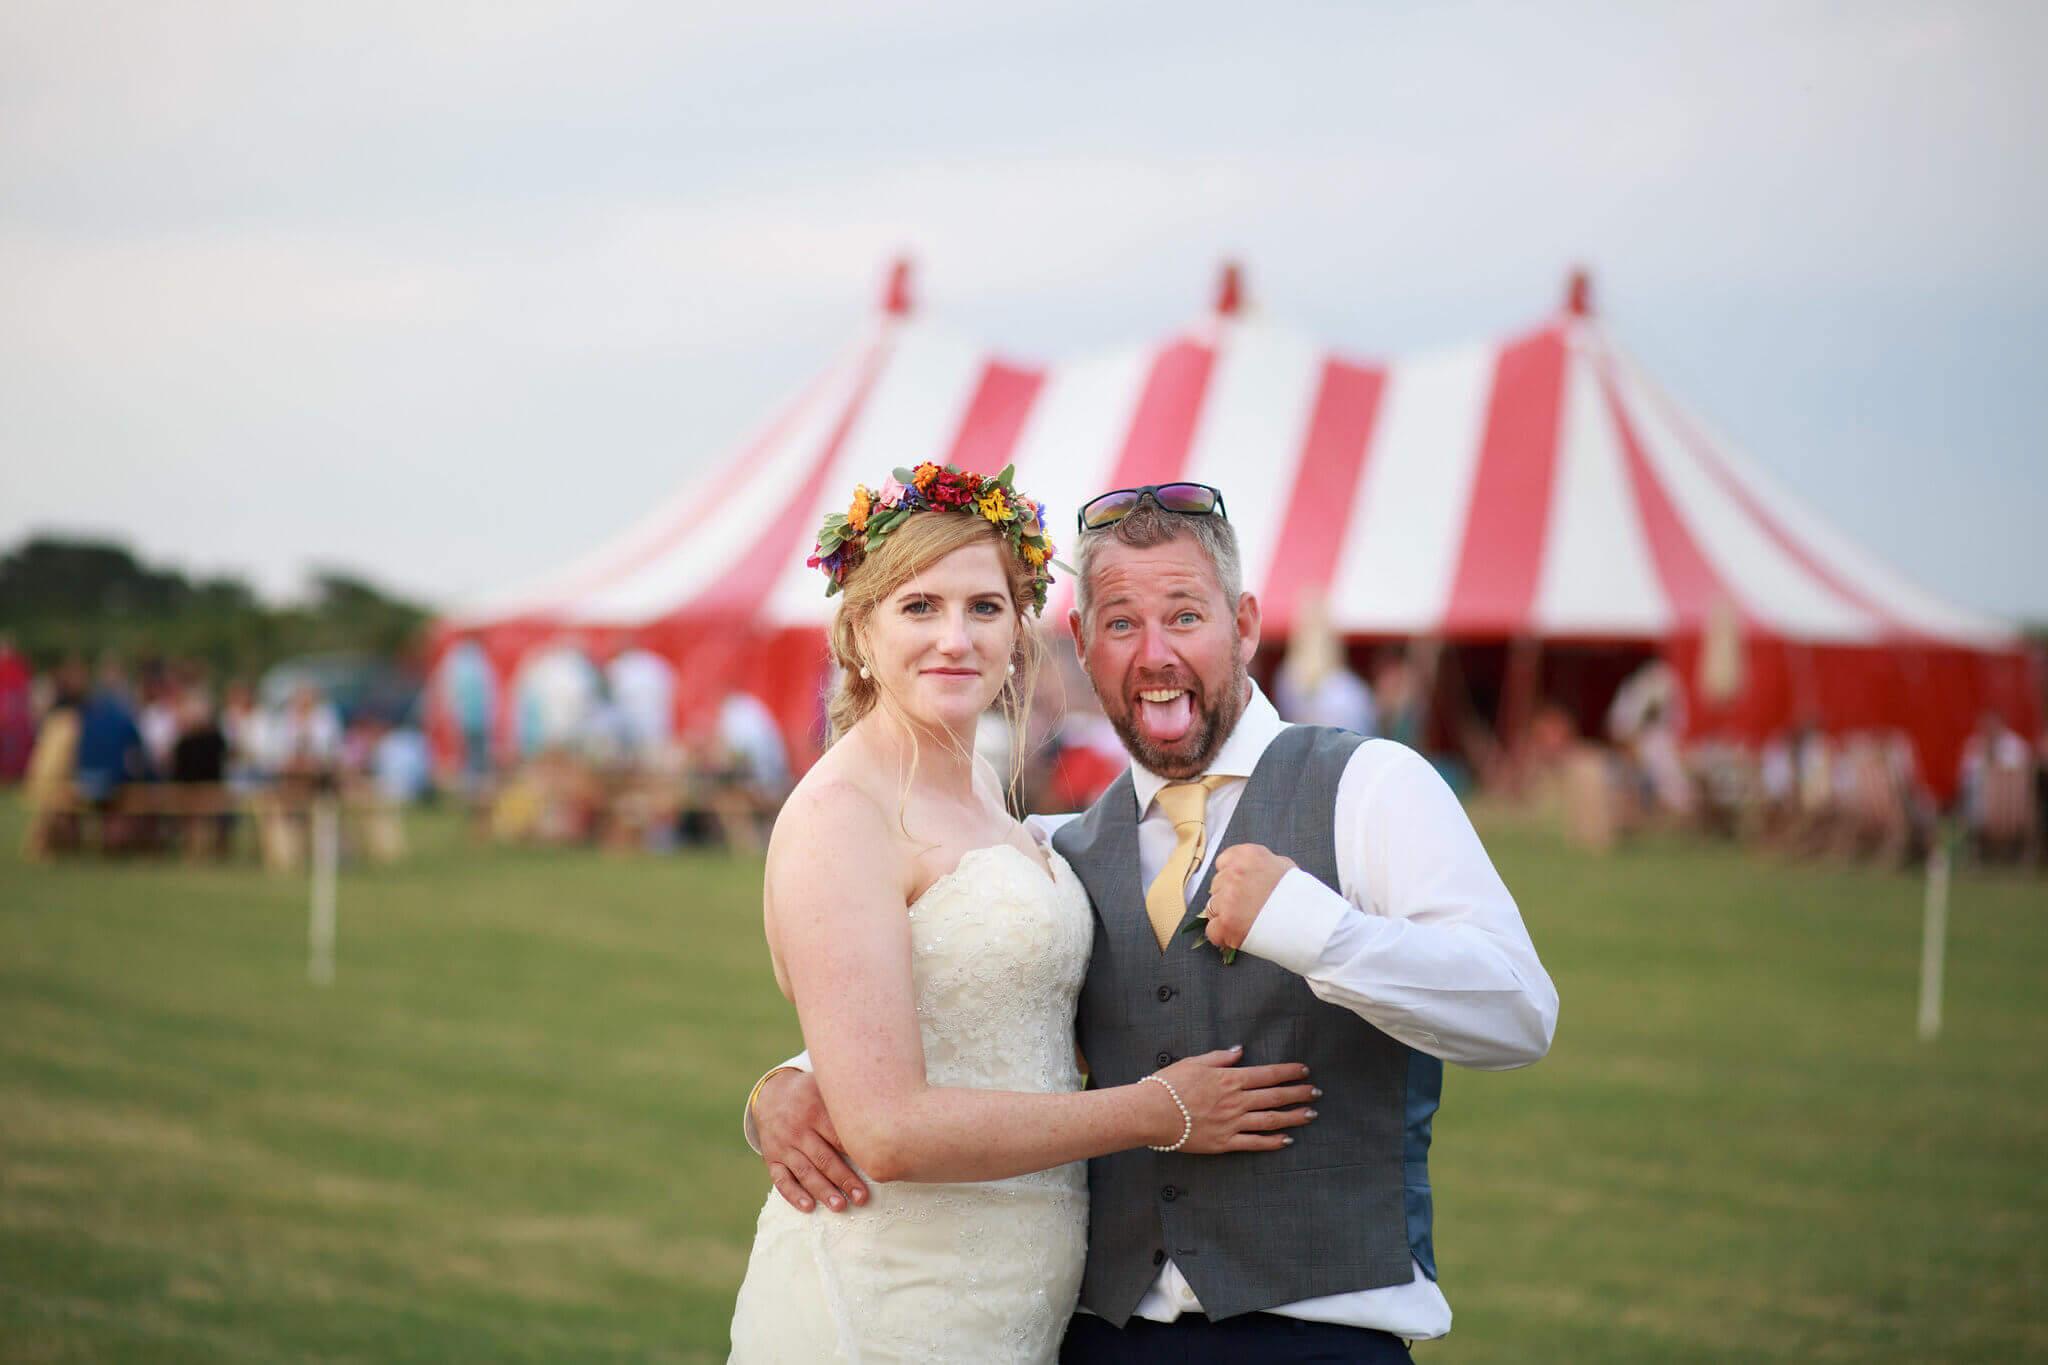 Aileen & Rob's wedding in Cornwall called Snugfest